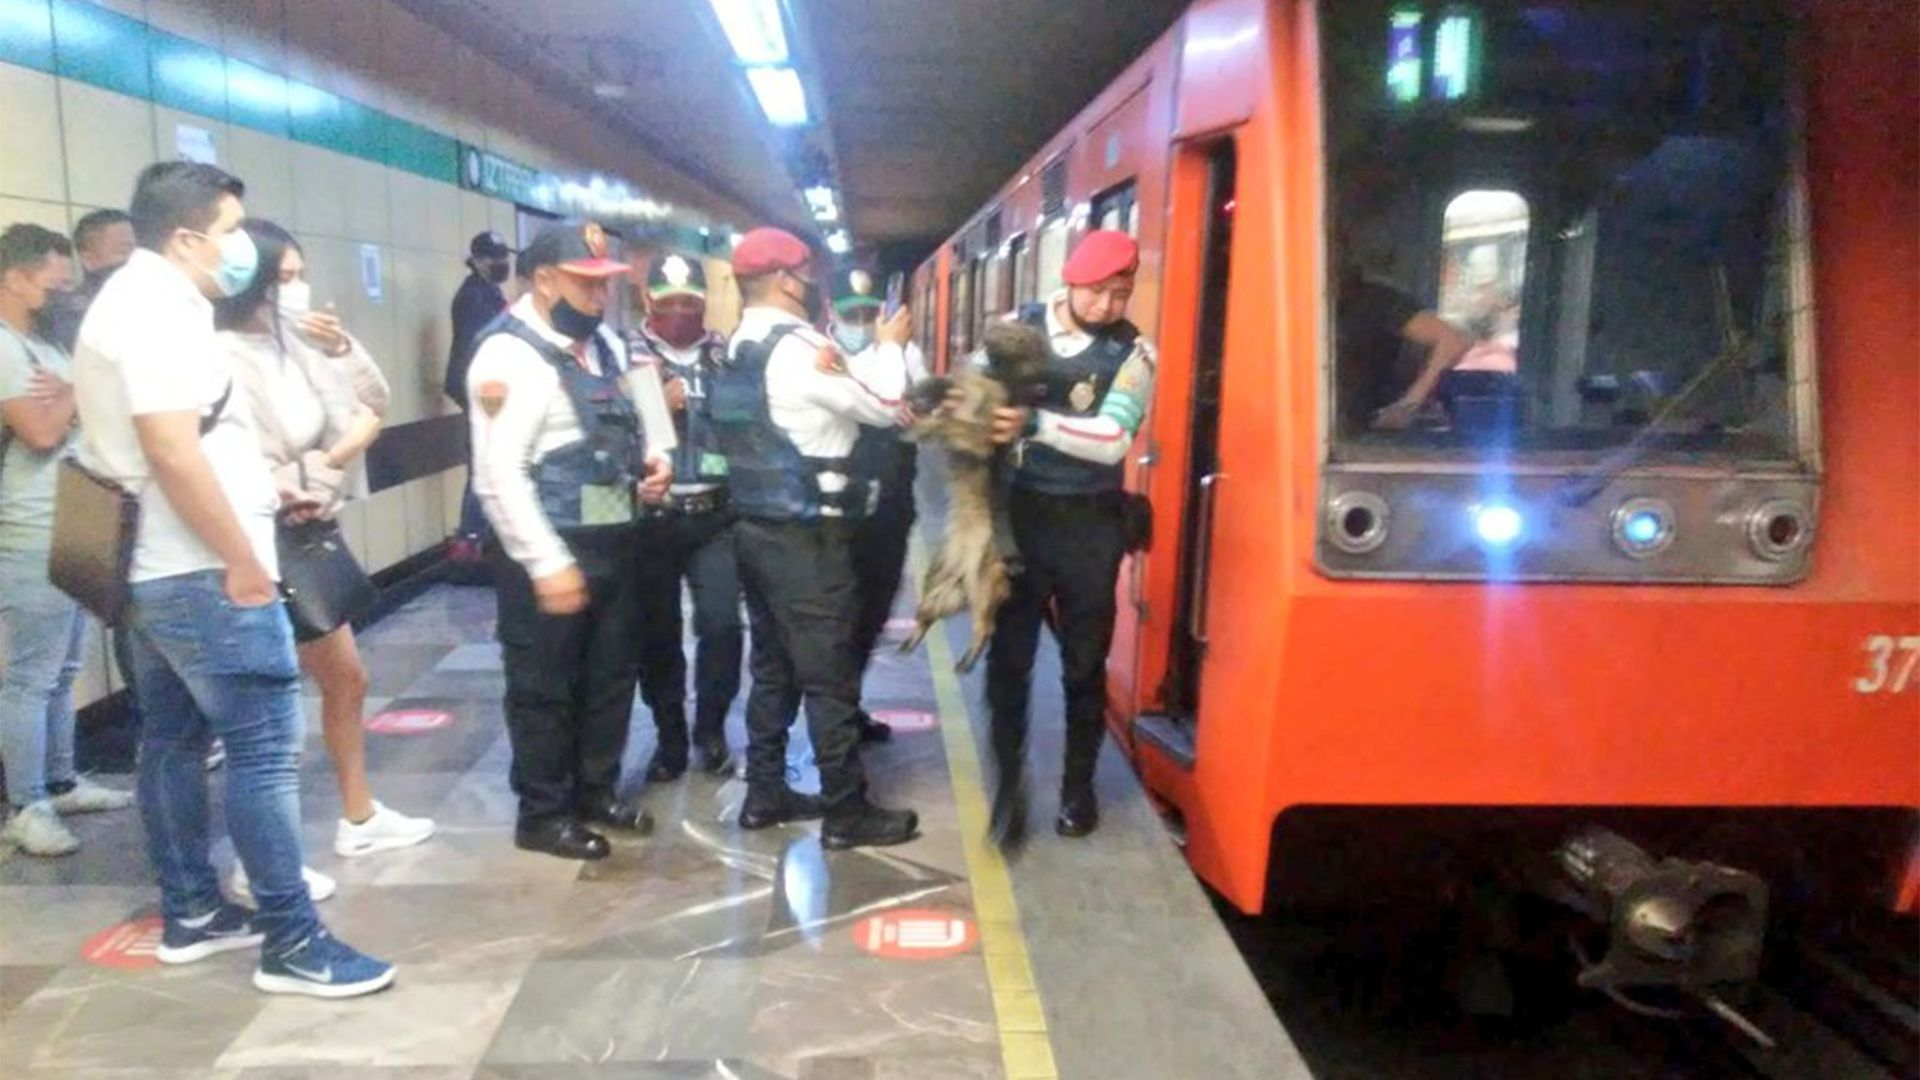 Perro rescatado metro (Foto: Twitter@MetroCDMX)